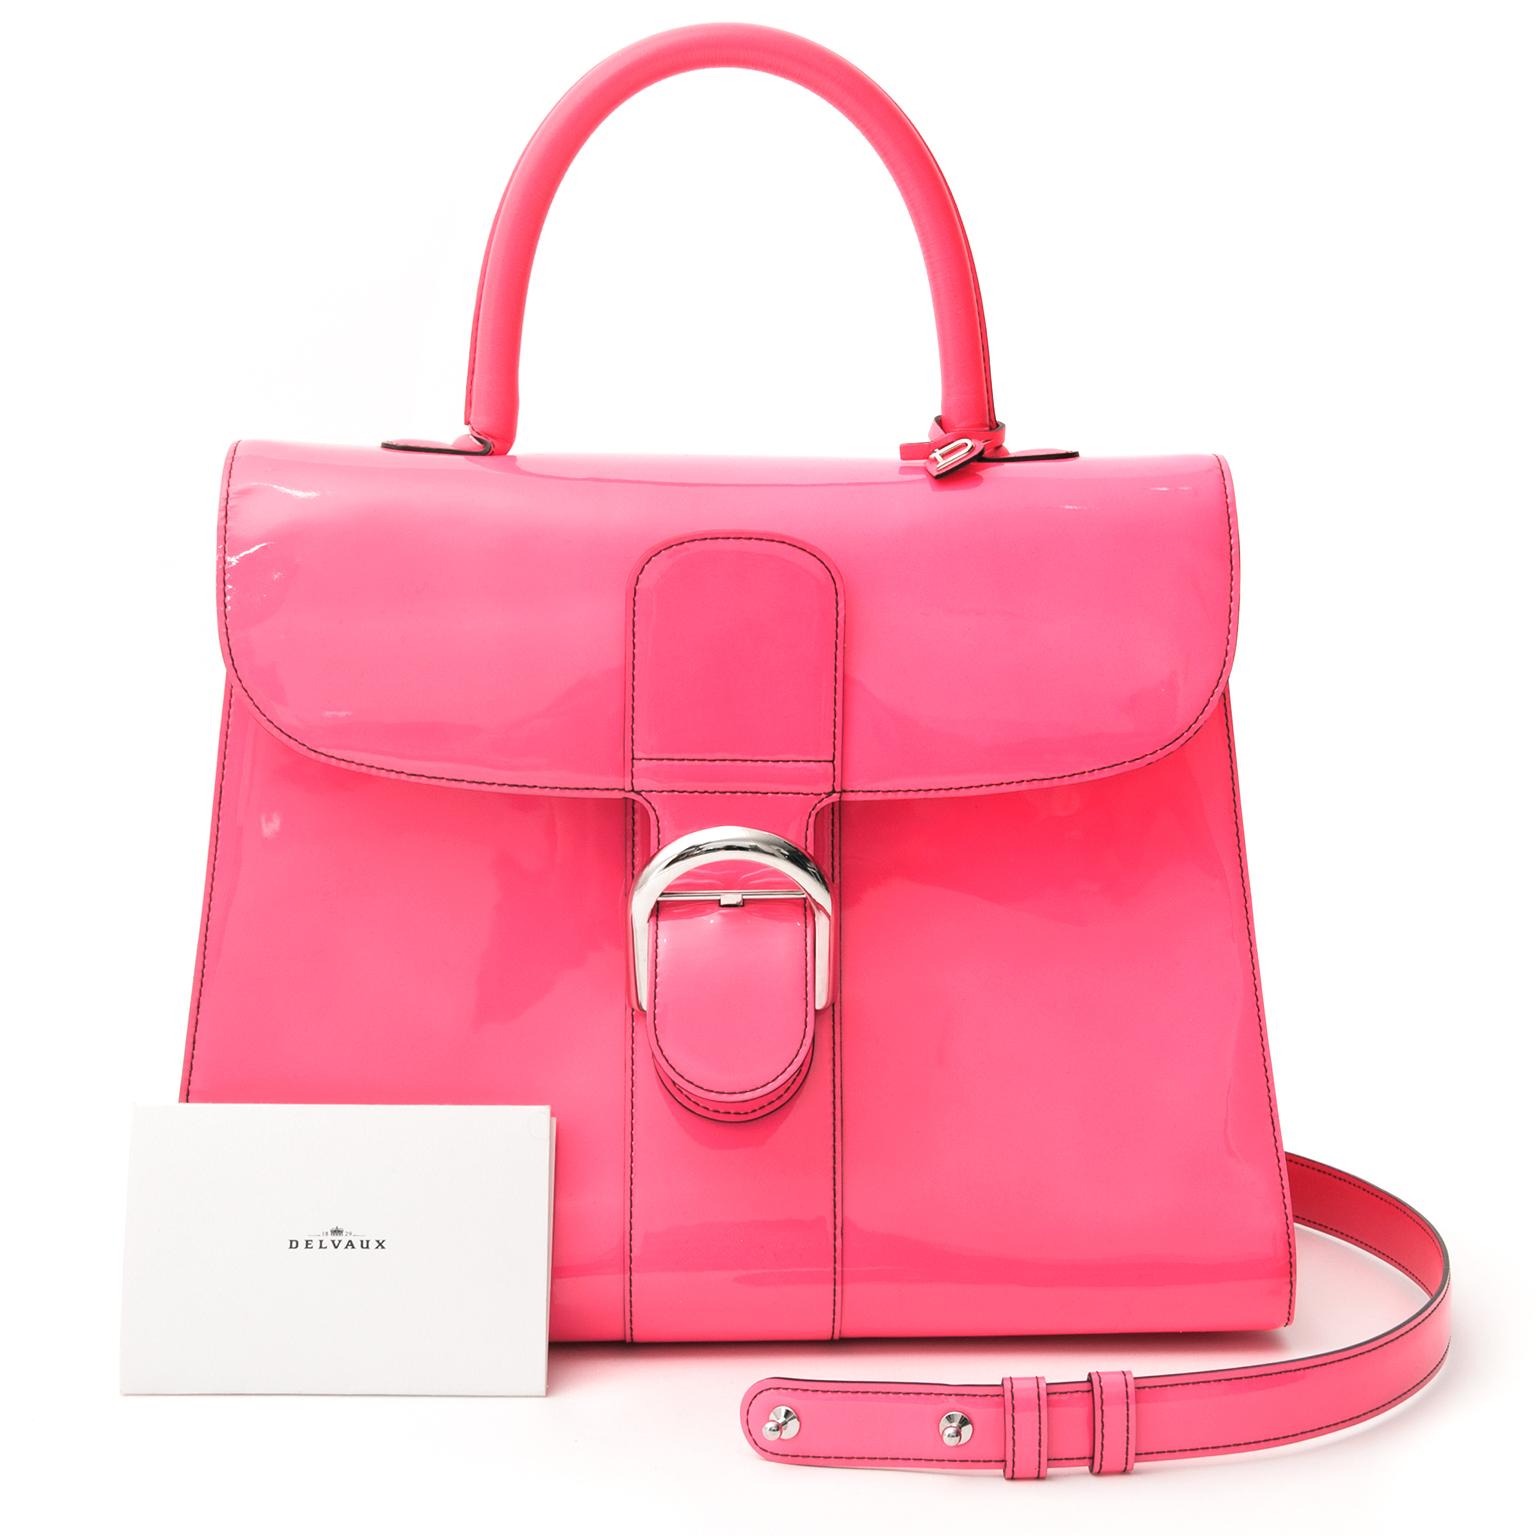 RARE BRAND NEW Pink Fluorescent Handbag worldwide shipping Delvaux , belgium , antwerp labellov.com